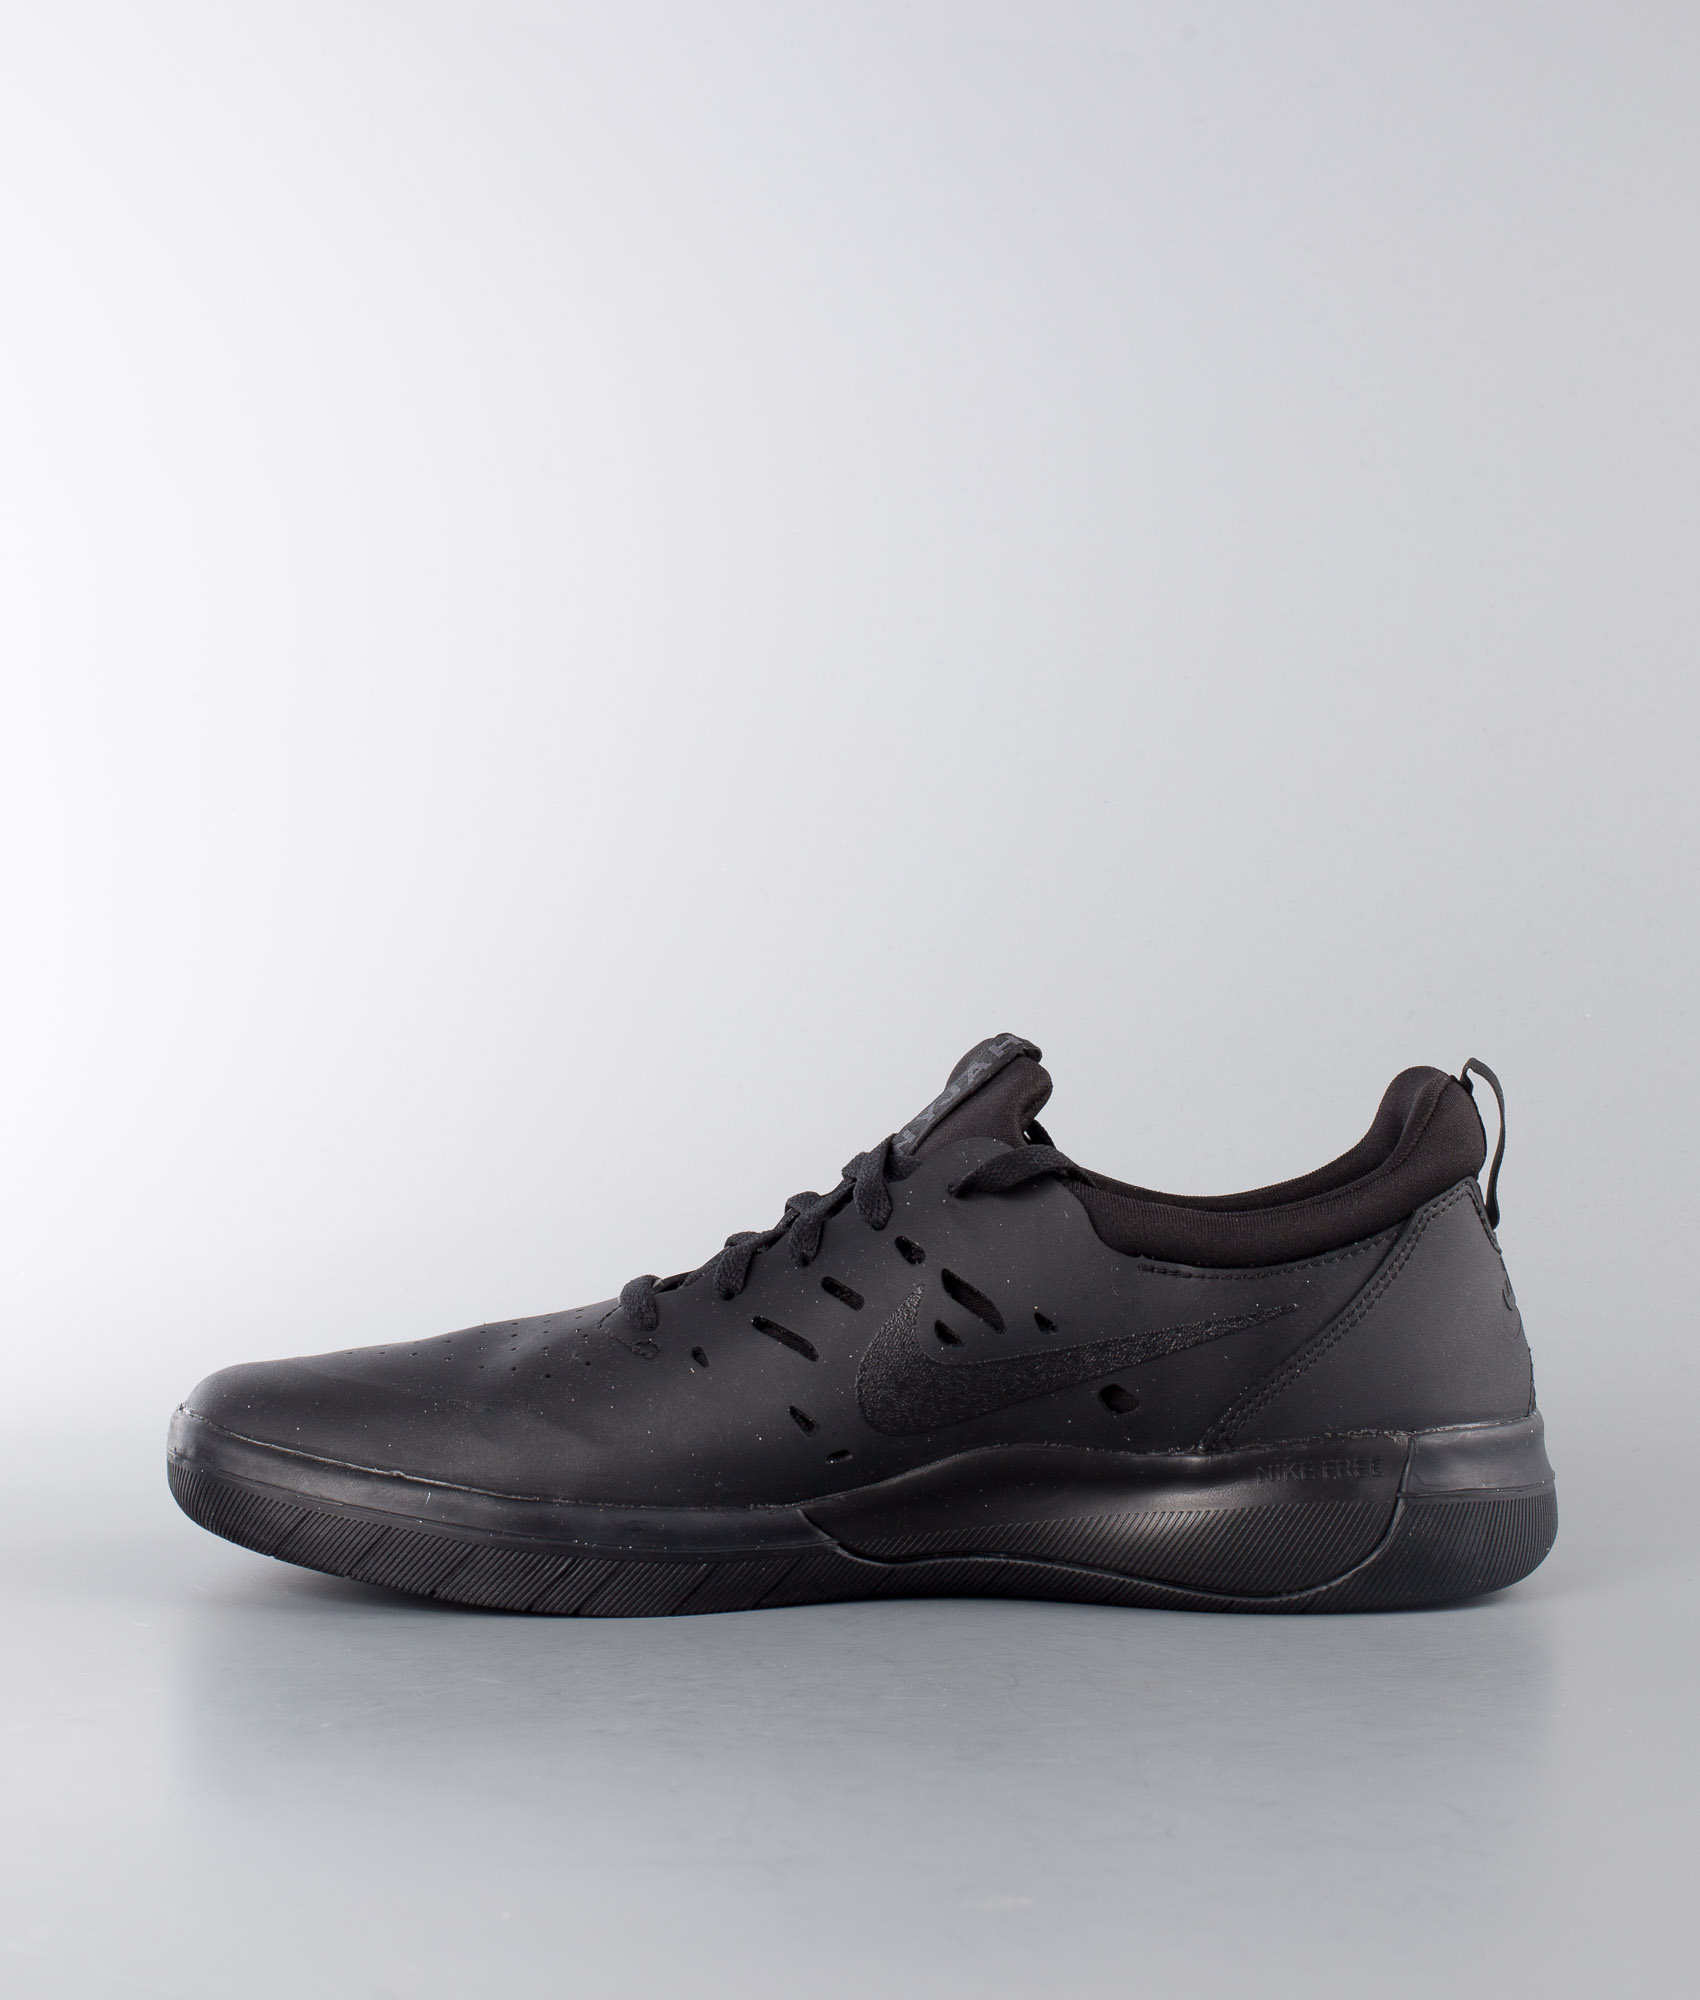 750557fd ... sweden italy nike free sko ridestore blackblack no black nyjah 5erqte  7aef5 0e3db 5487a 3e286